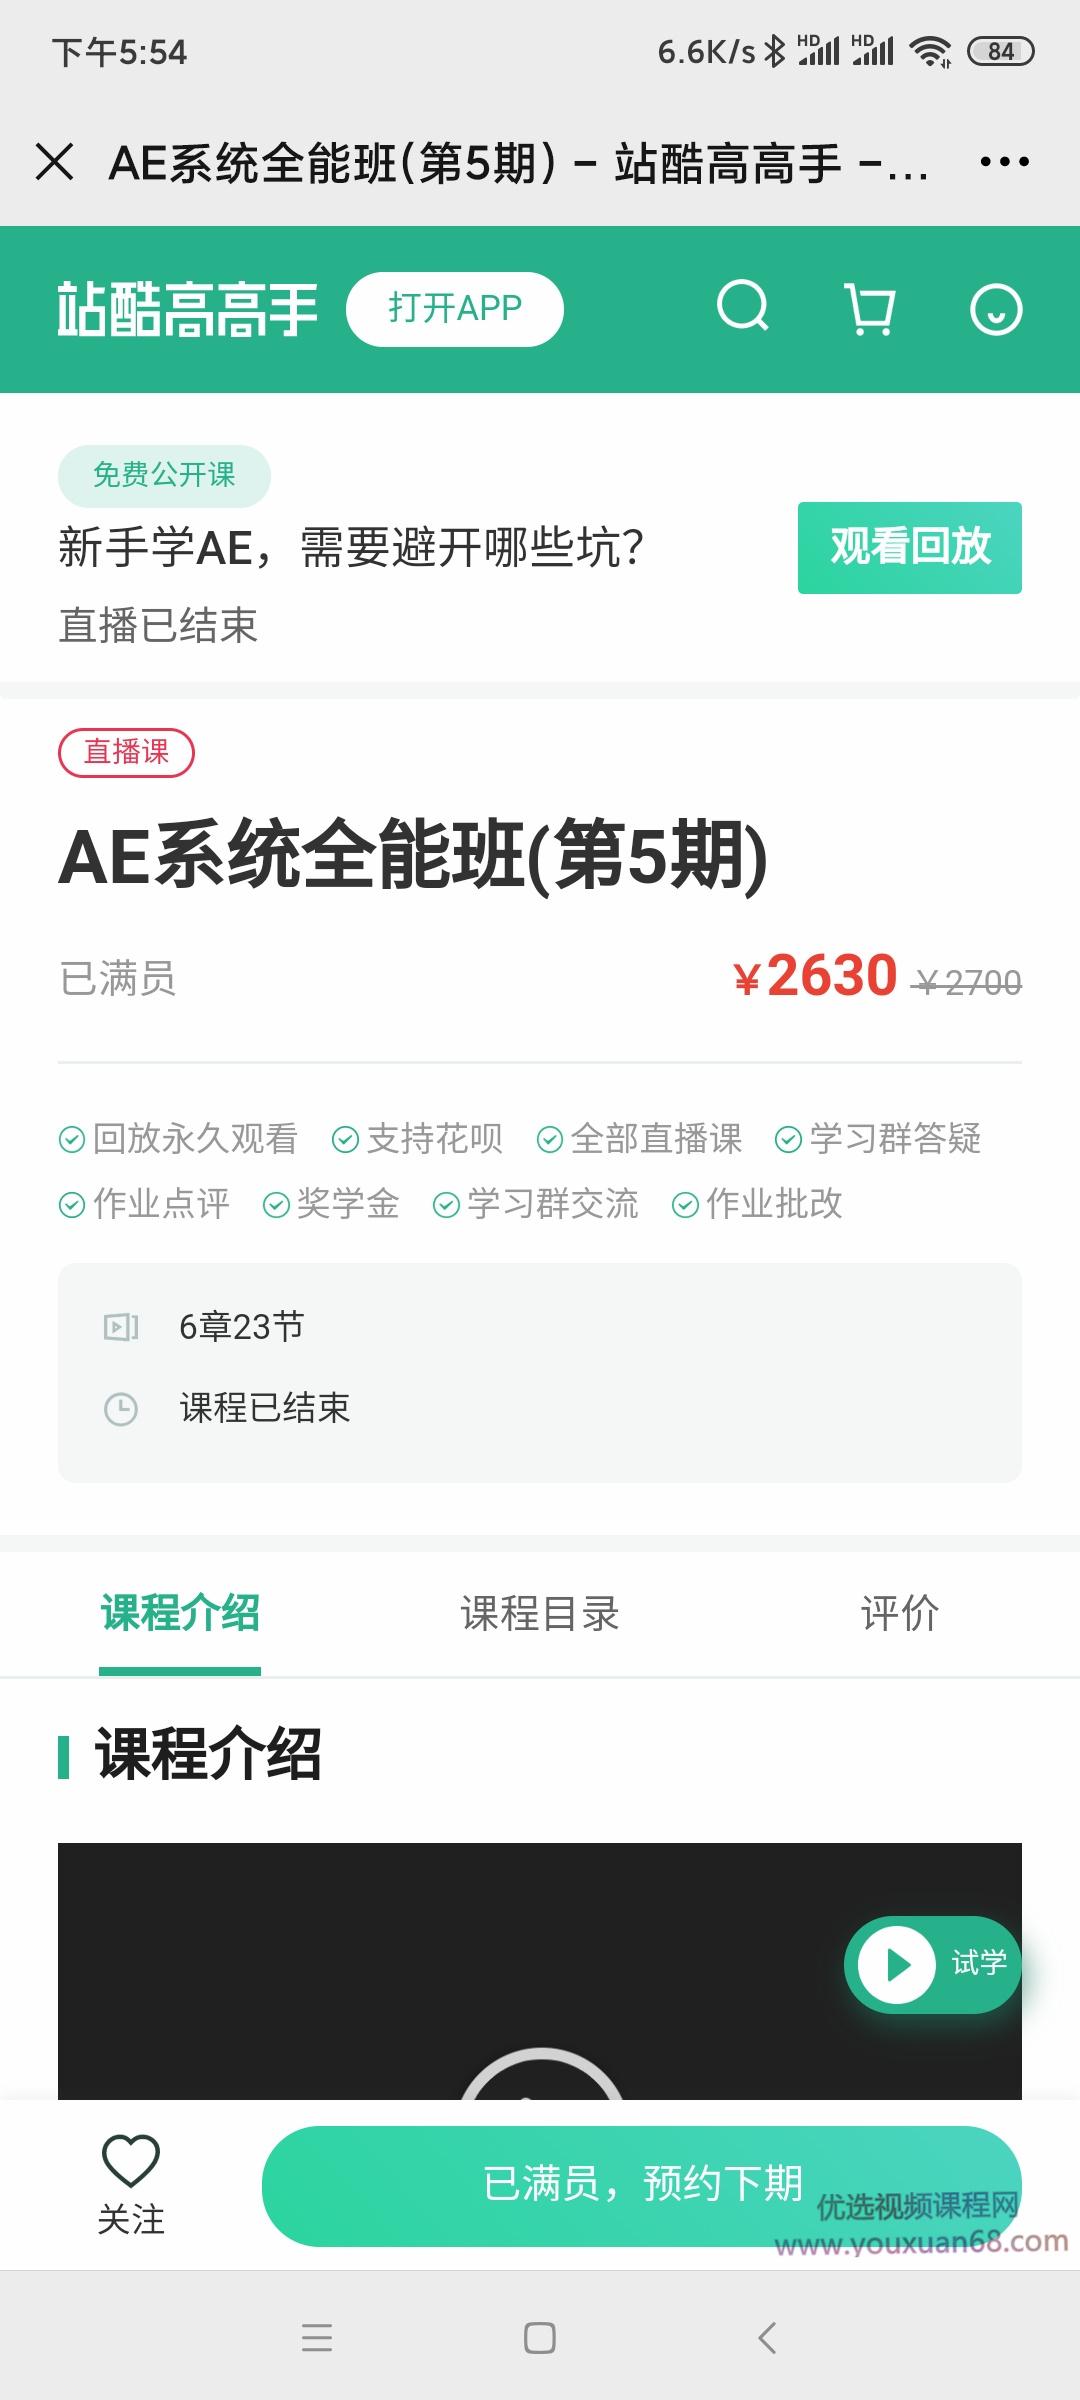 【tvart&郭术生】AE系统全能班(第4期)